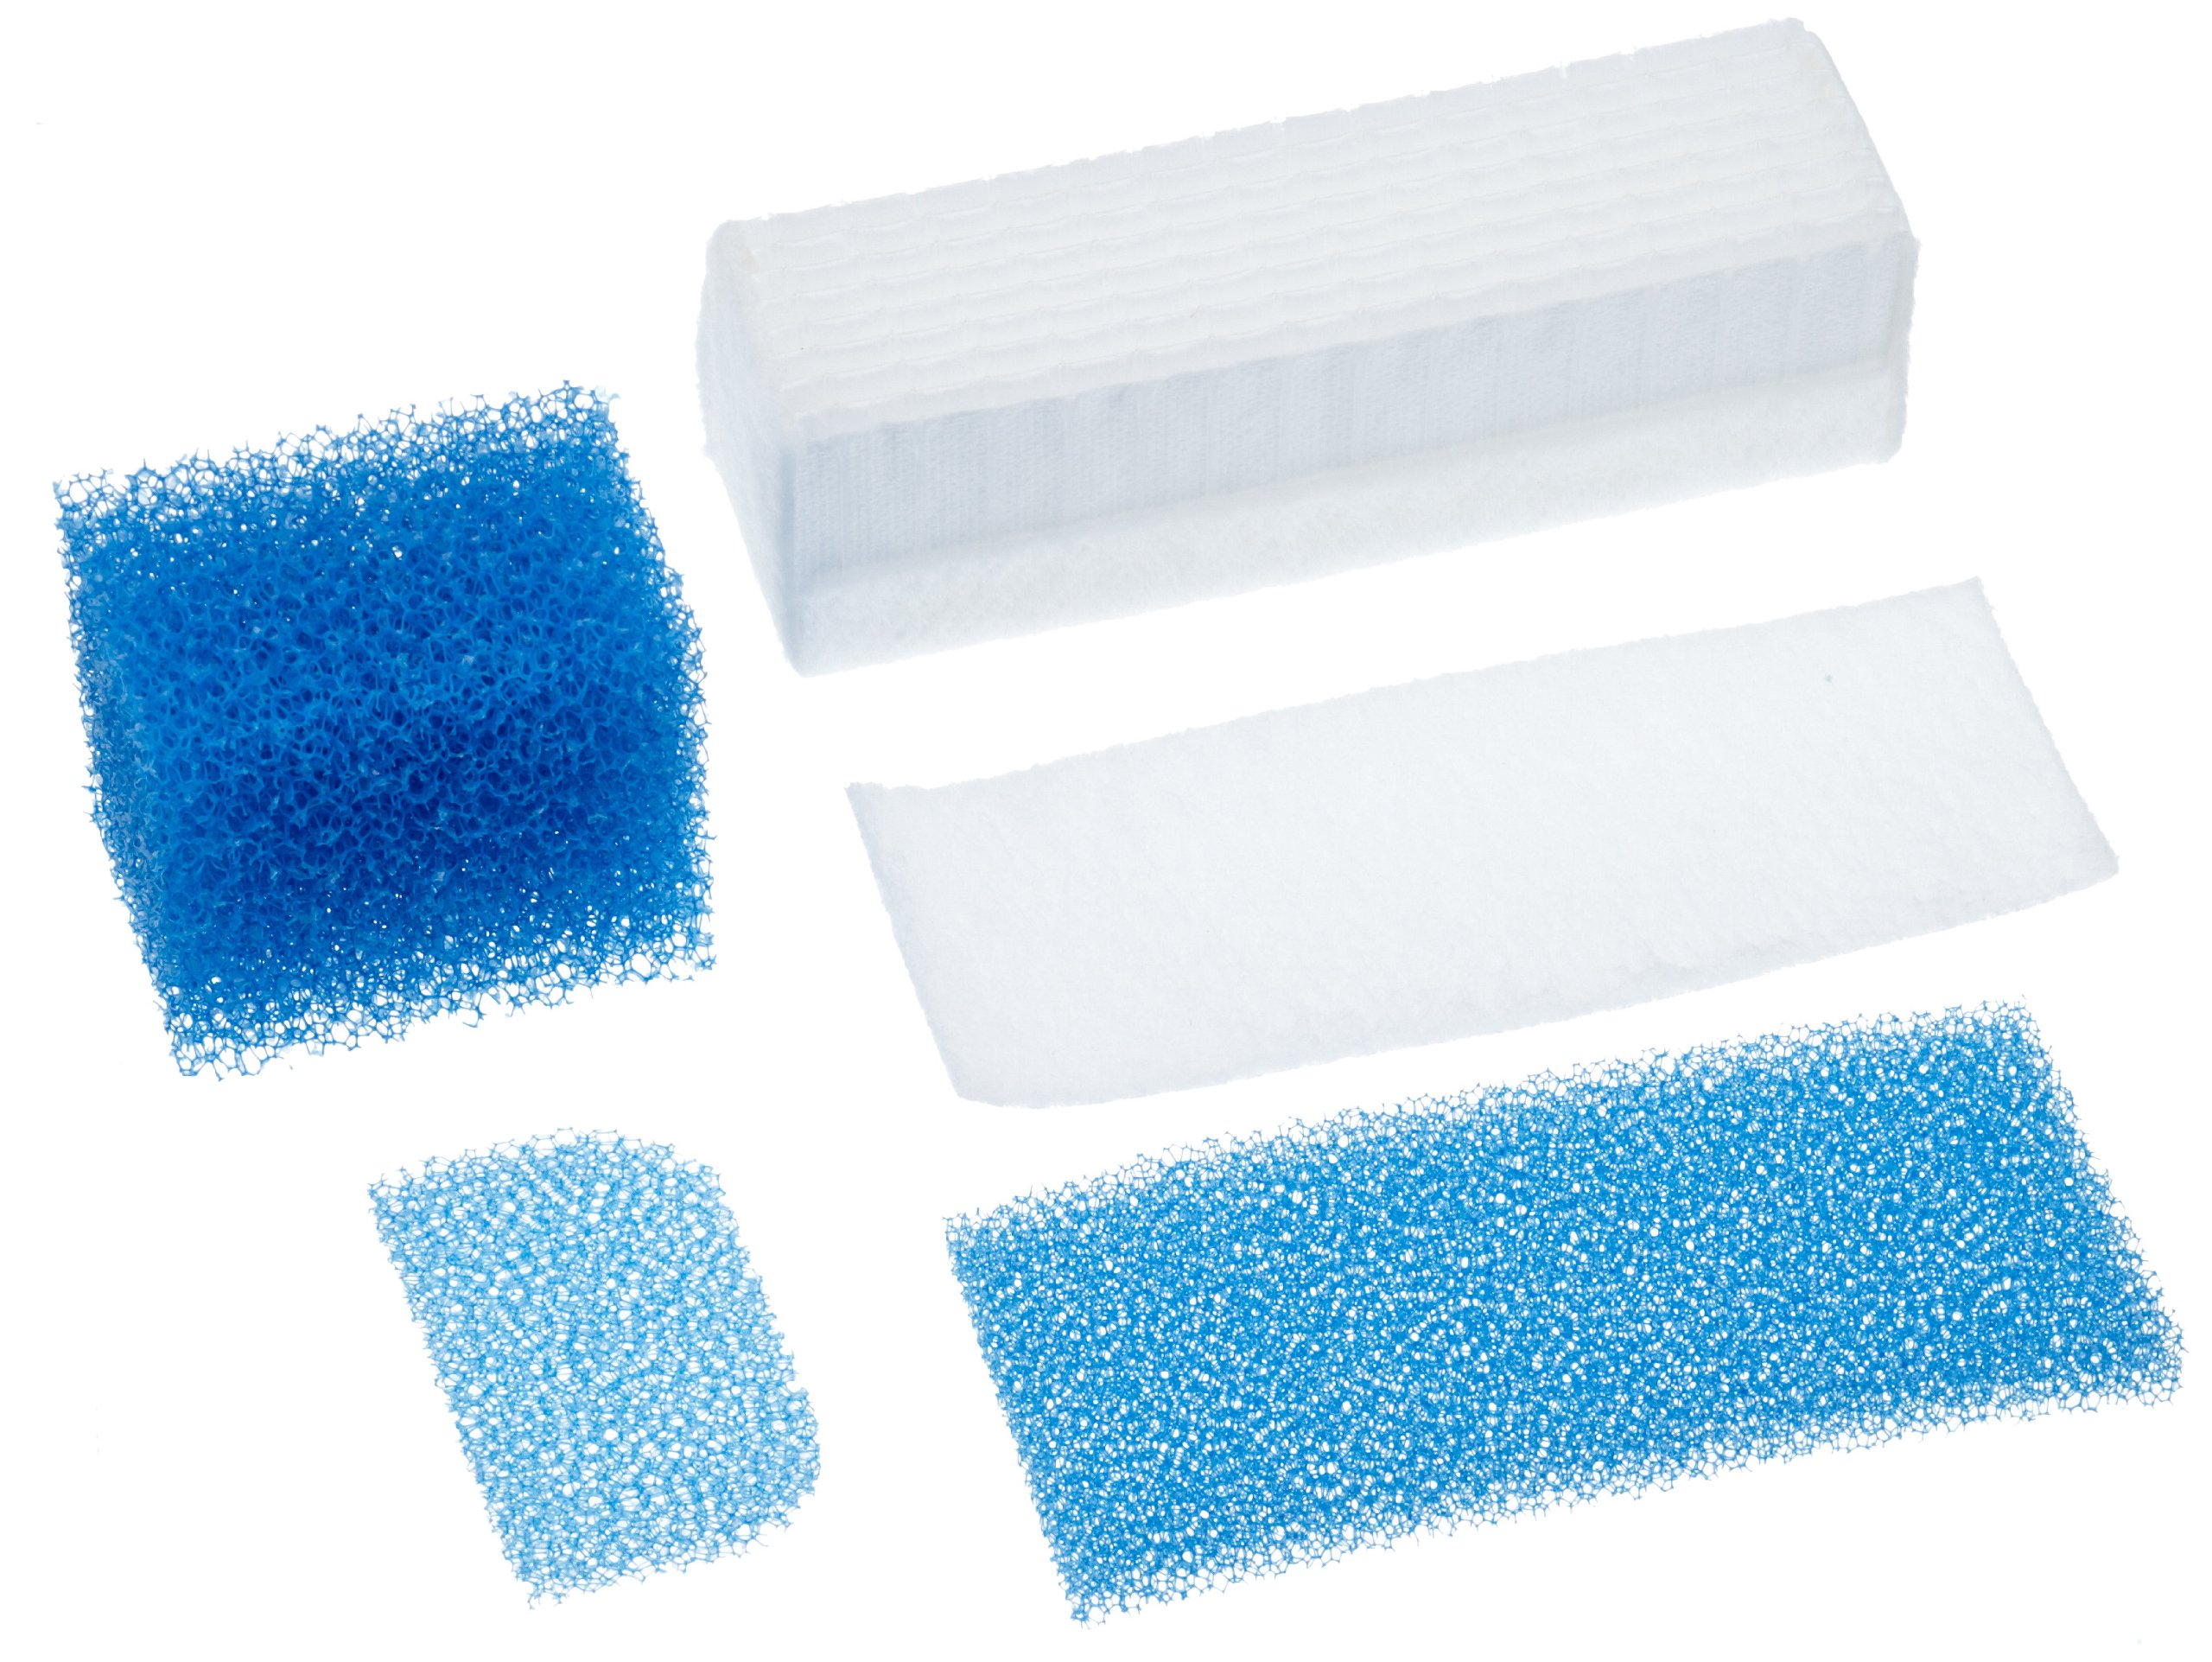 Thomas Hepa Filter Set Suitable for Models TWIN TT/TWIN T2 / GENIUS/GENIUS S 2